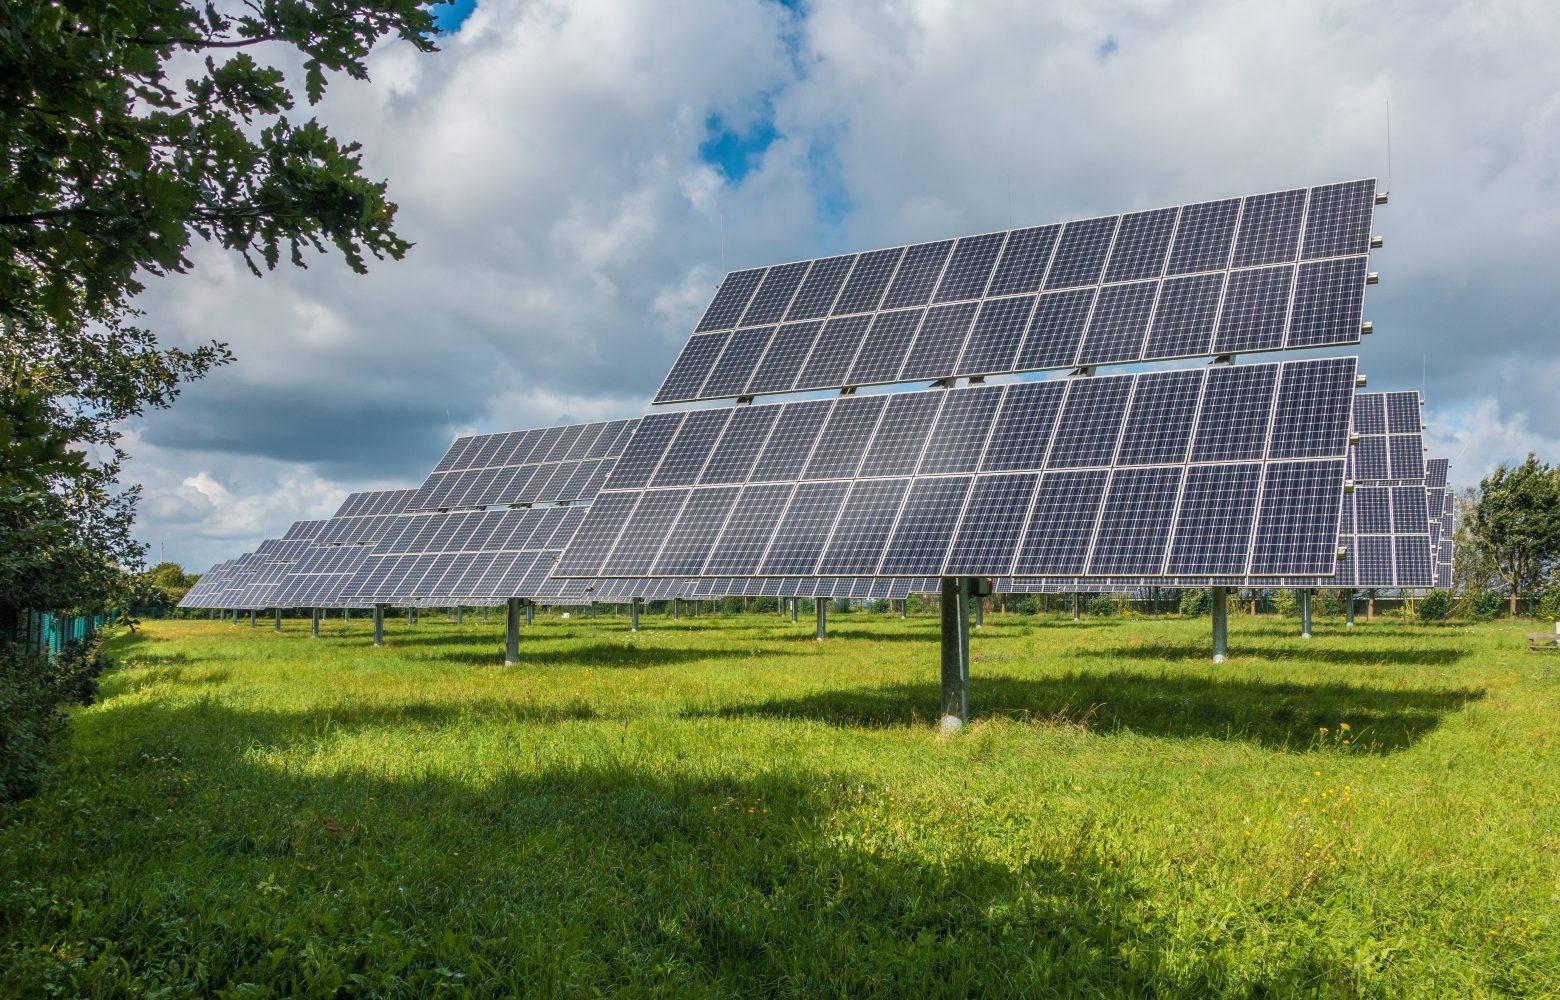 Photovoltaik-Anlage (Bild: Pixabay.com)